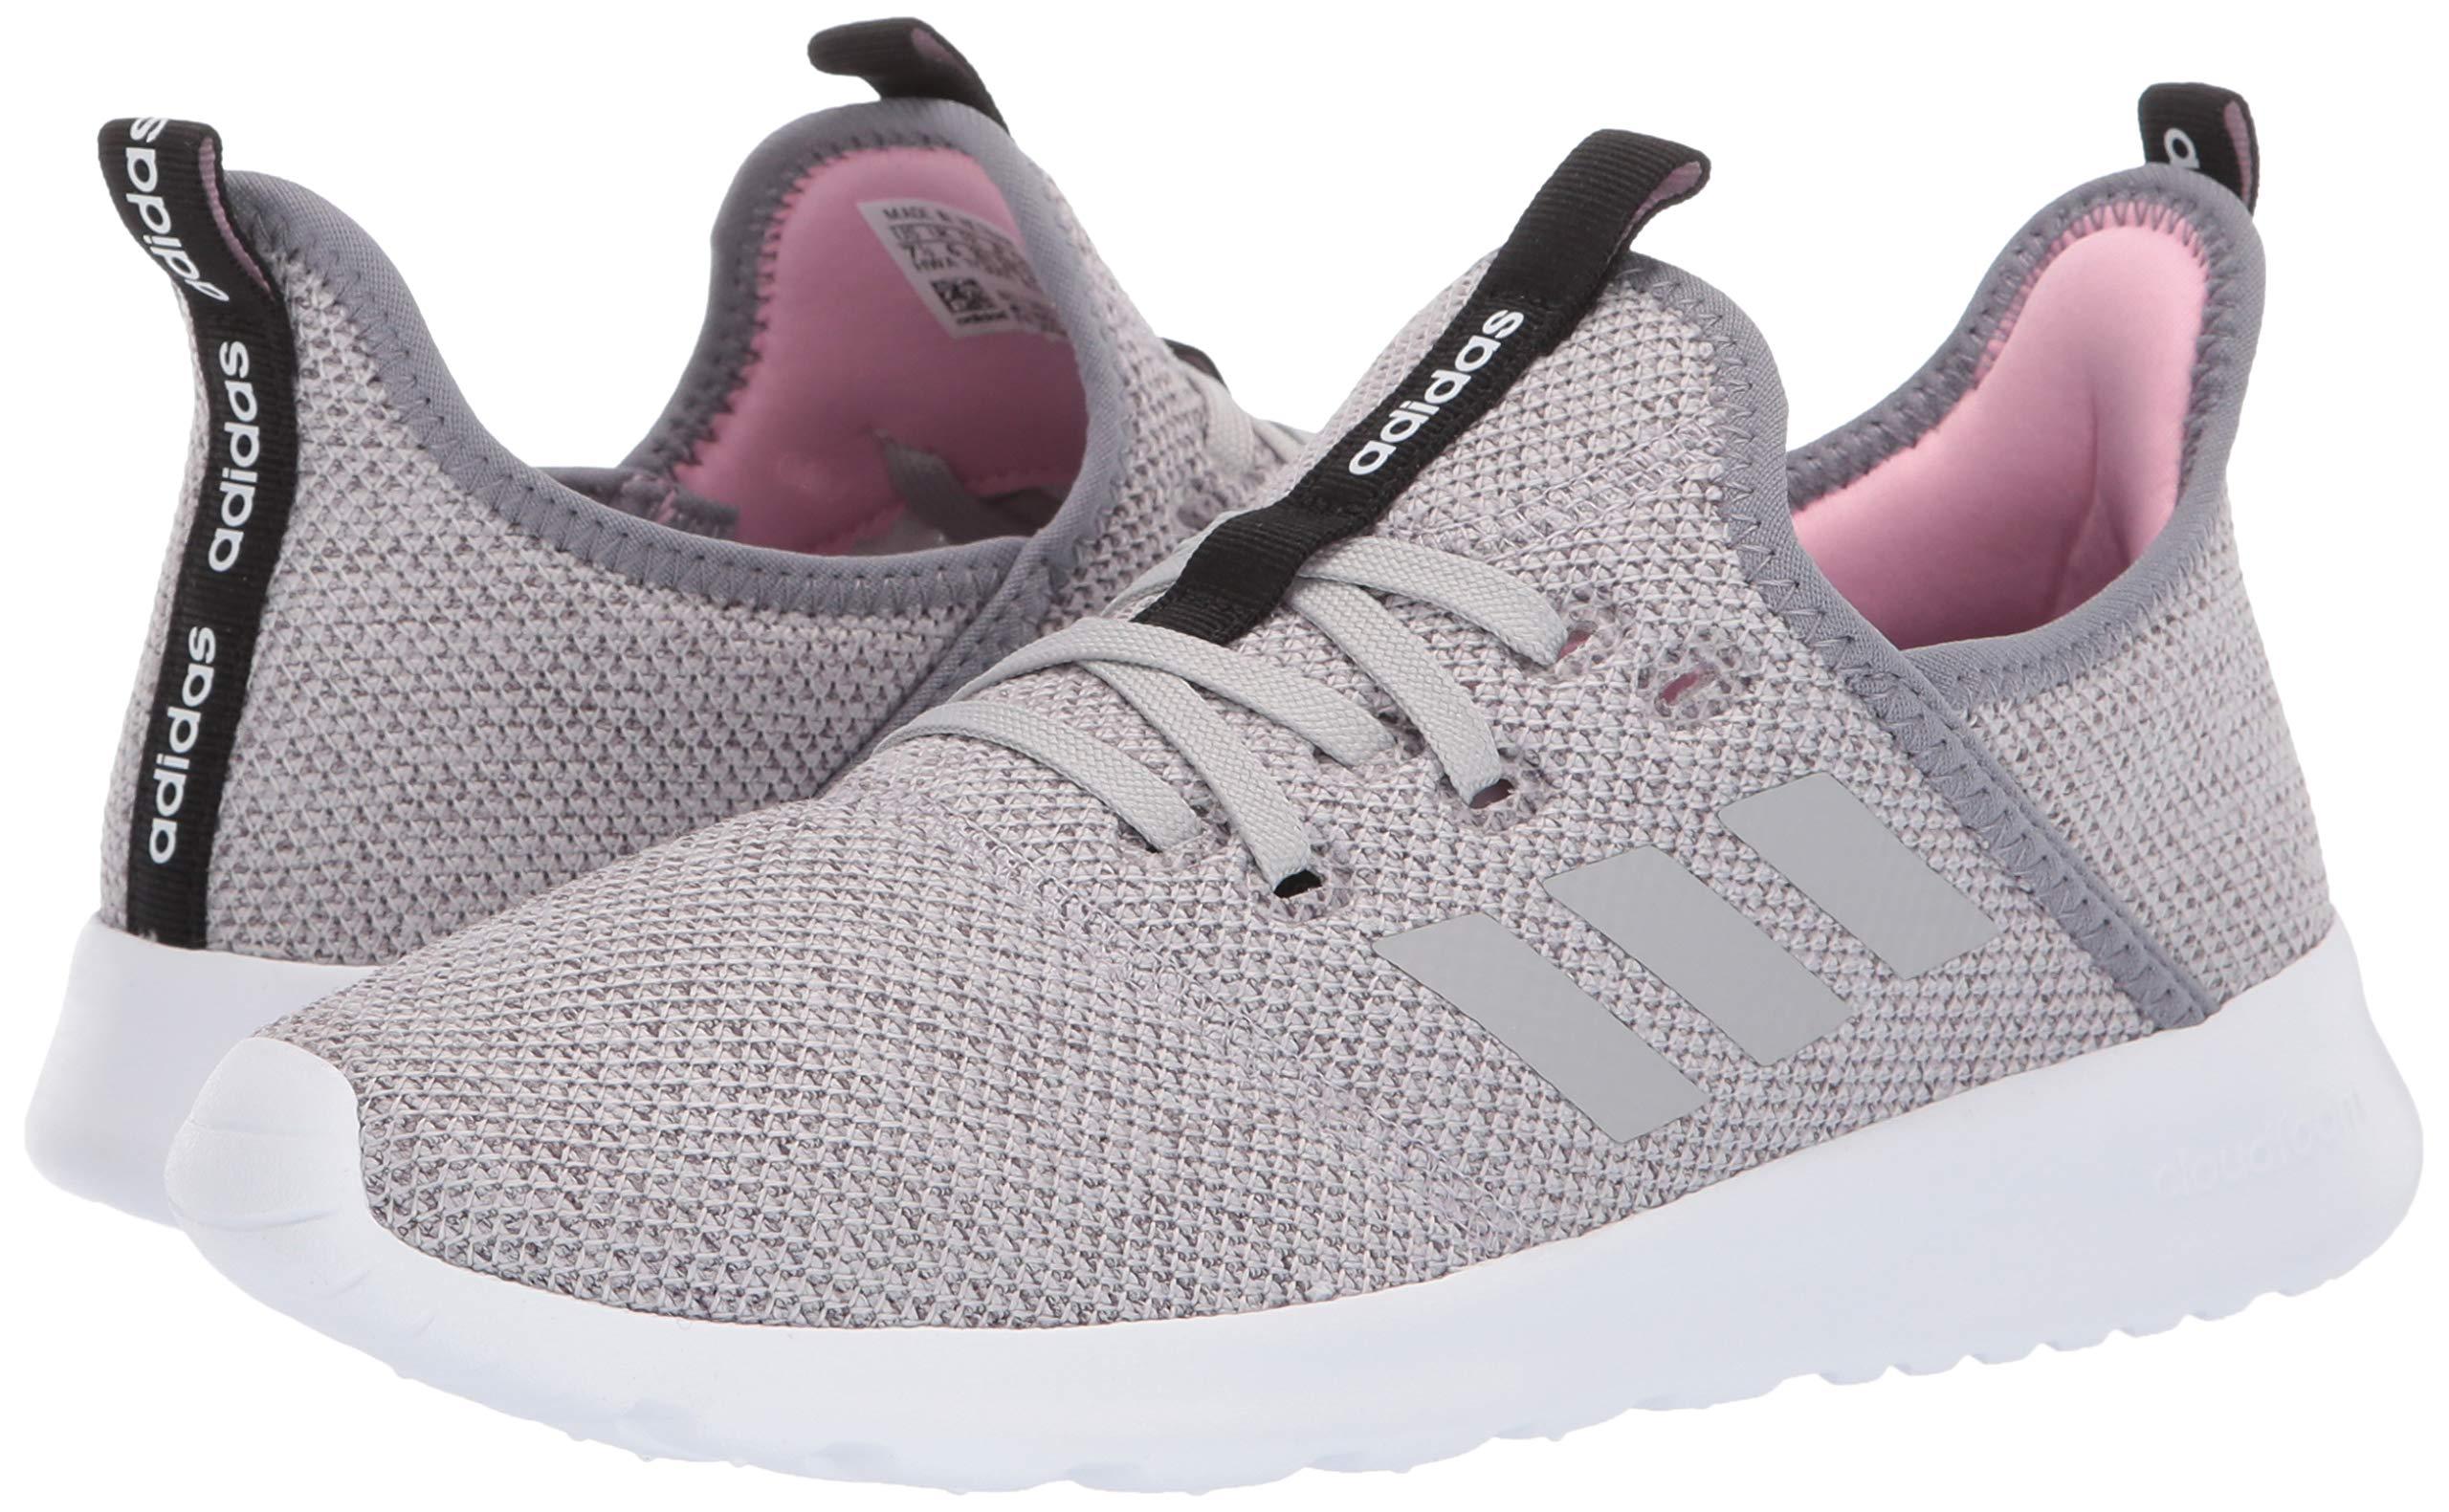 adidas Women's Cloudfoam Pure, Grey/True Pink, 5.5 M US by adidas (Image #6)